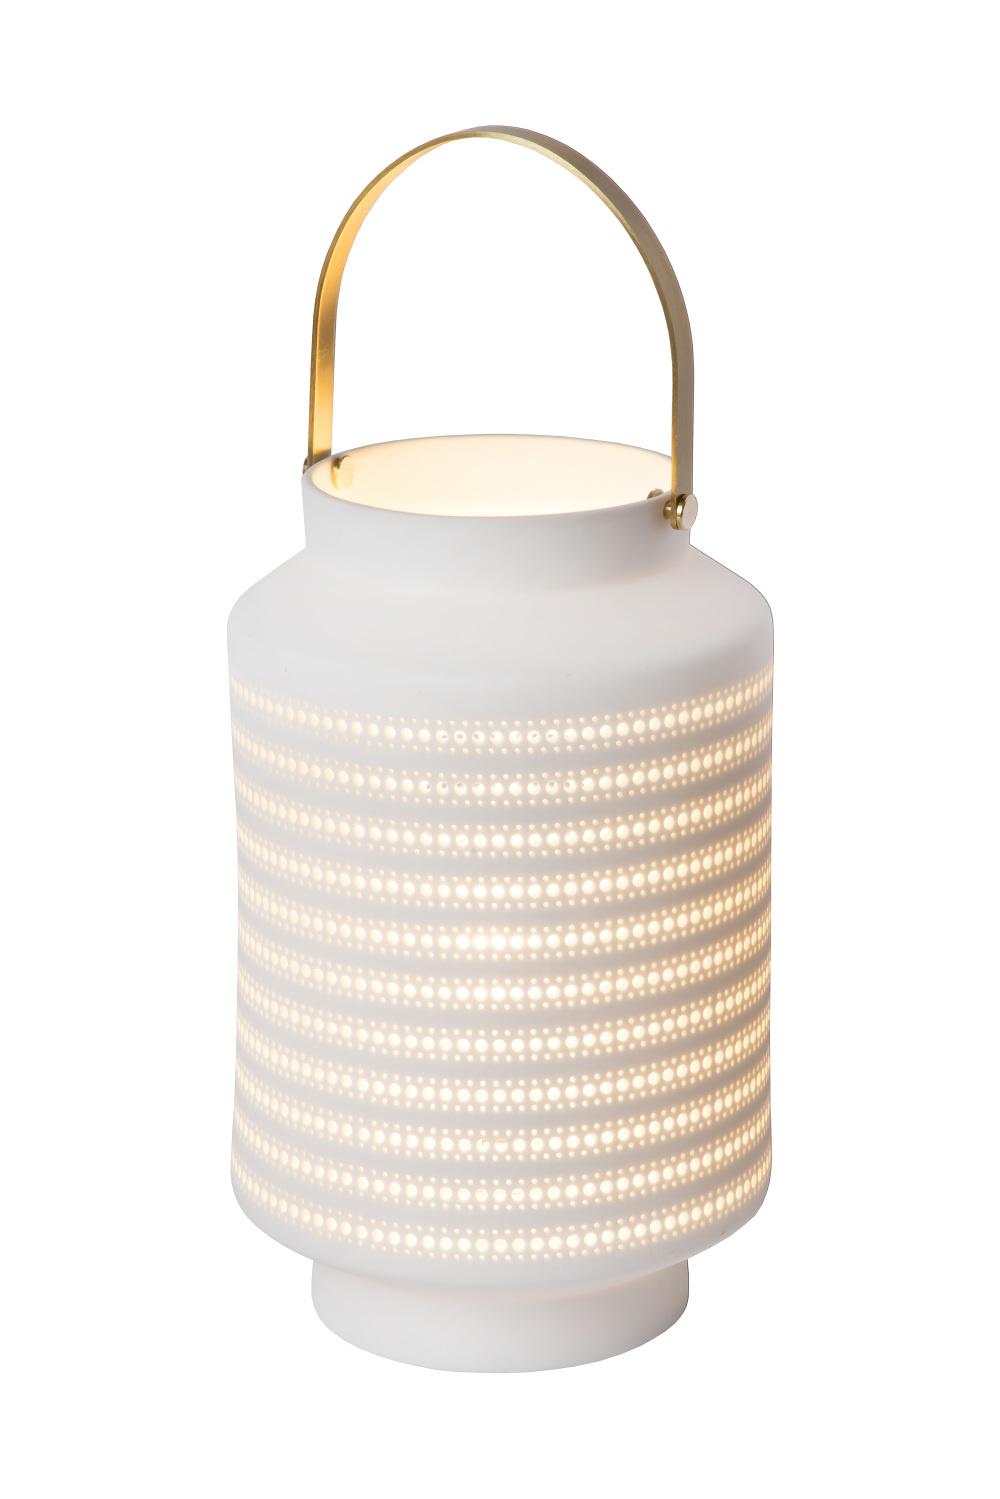 Lucide JAMILA Tafellamp-Wit-Ø15,5-1xE14-25W-Porsel.